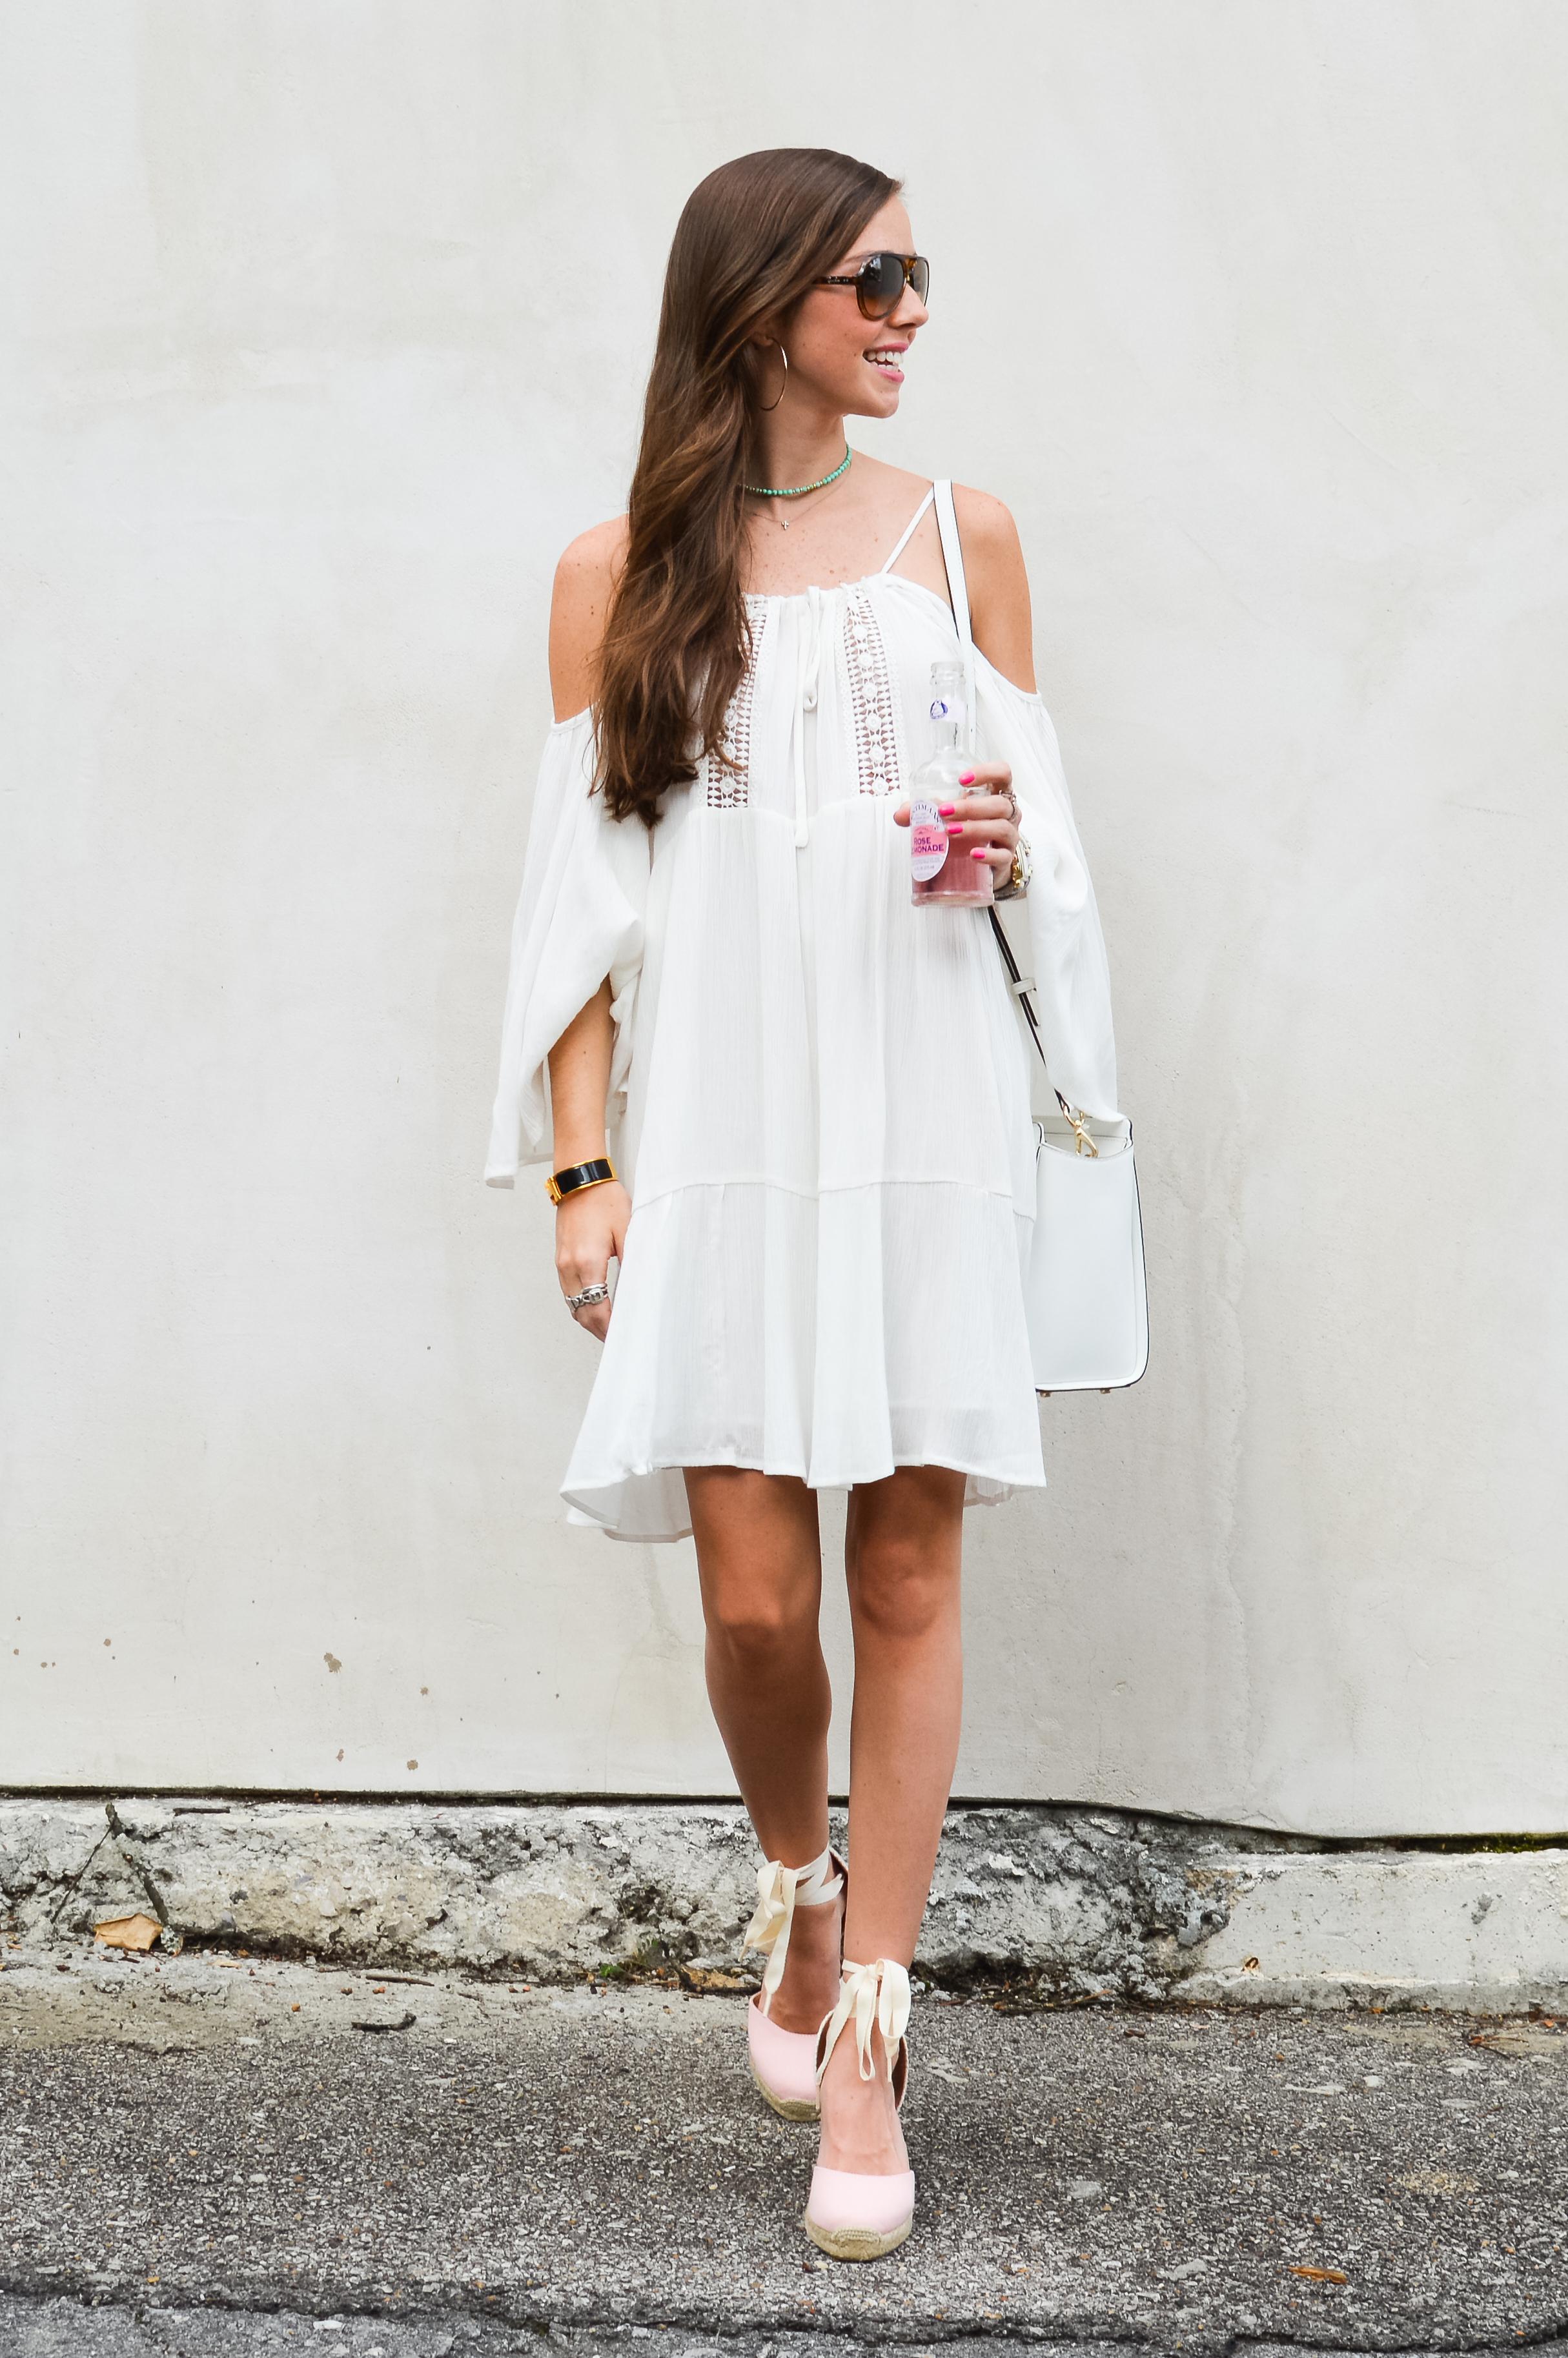 fe5189fde694 lcb style fashion blogger soludos wedge espadrilles (14 of 23).jpg